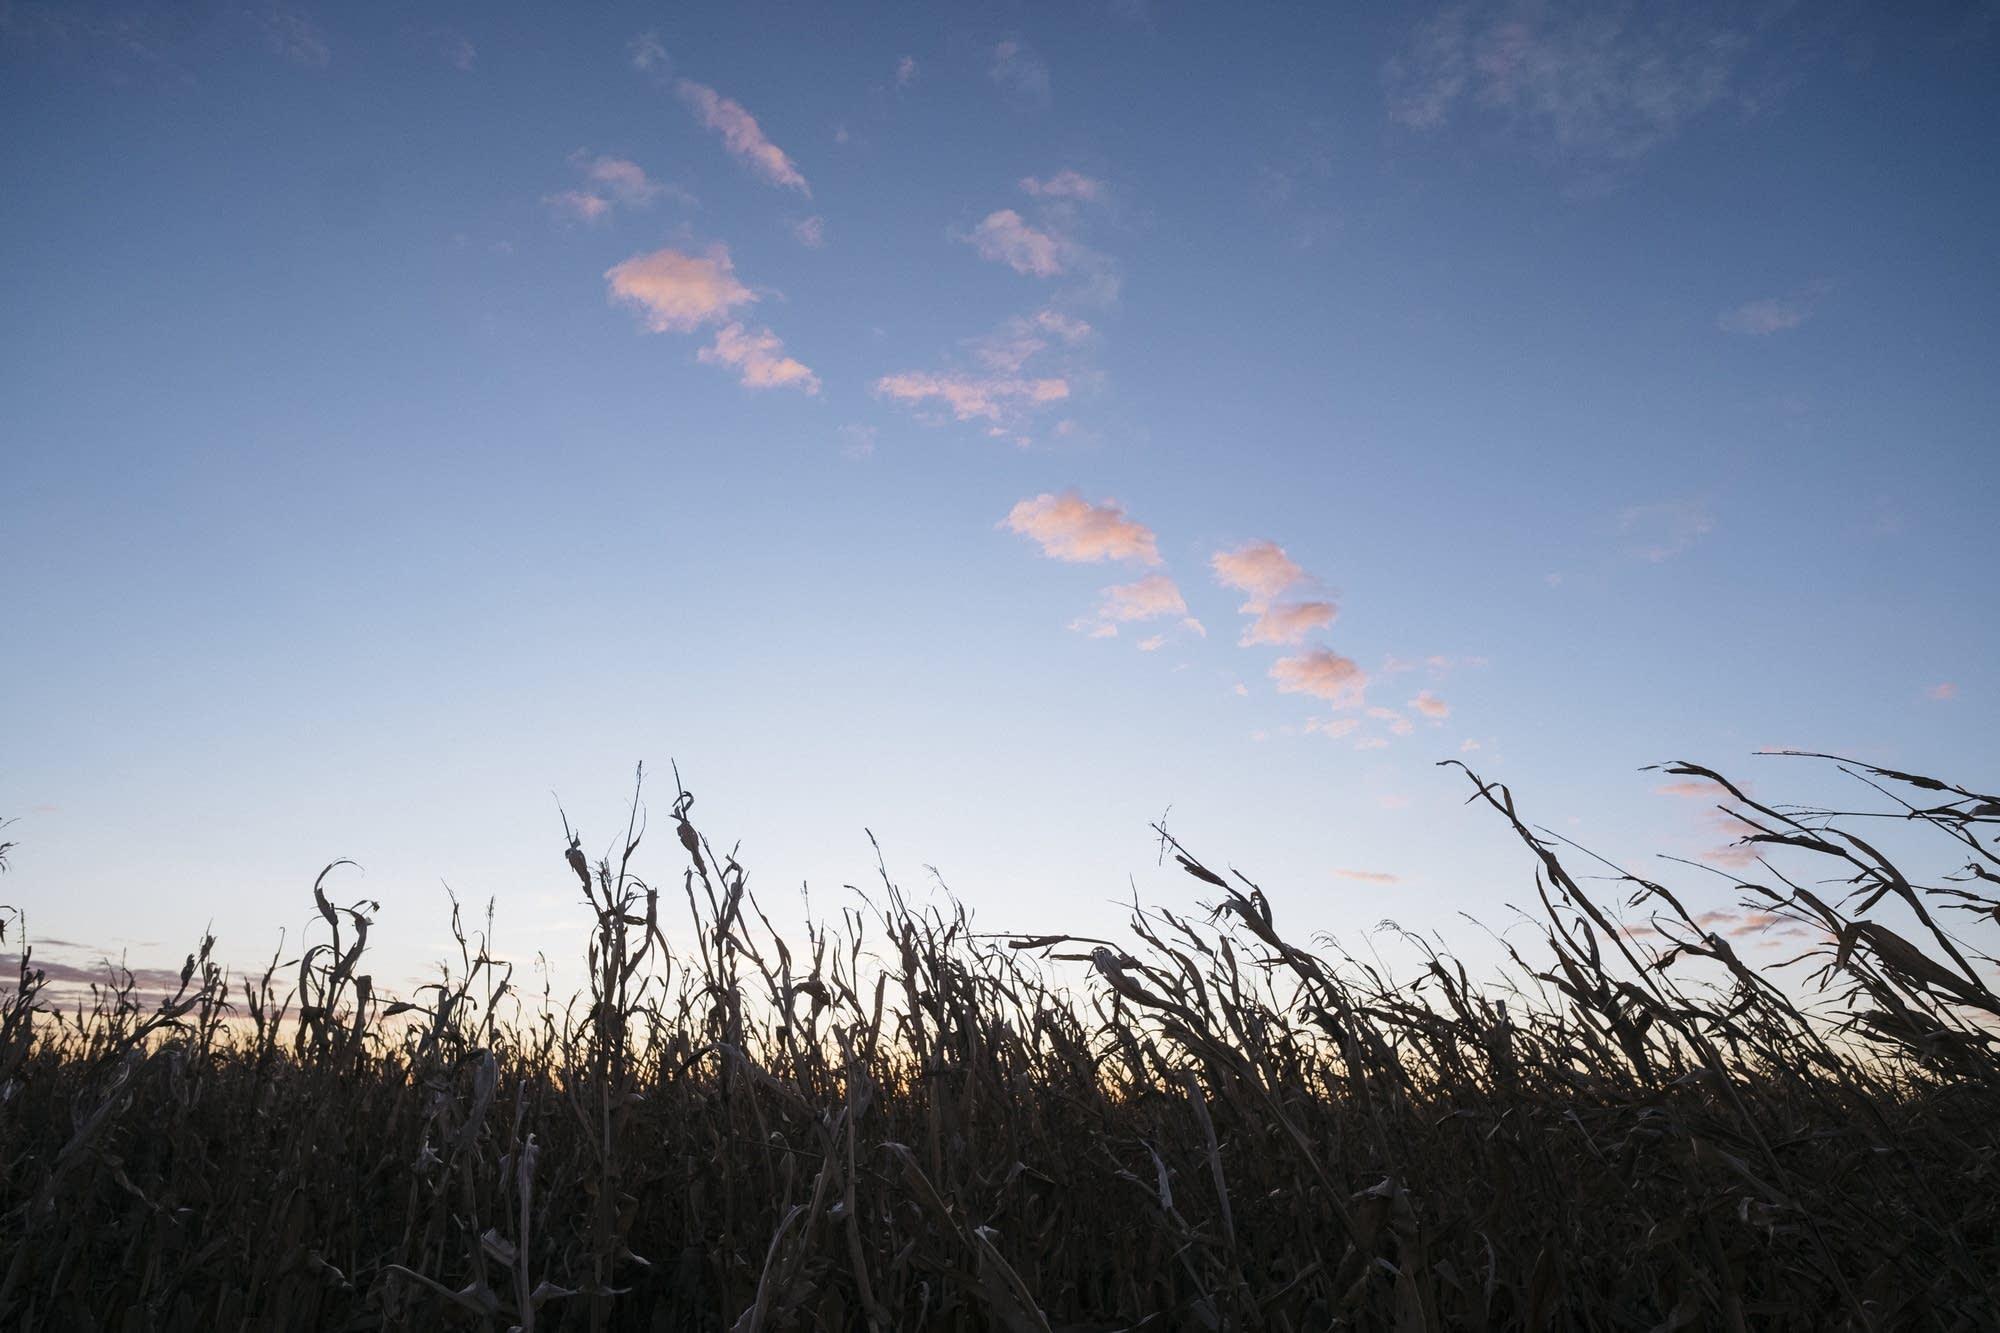 The sun rises over corn stalks.